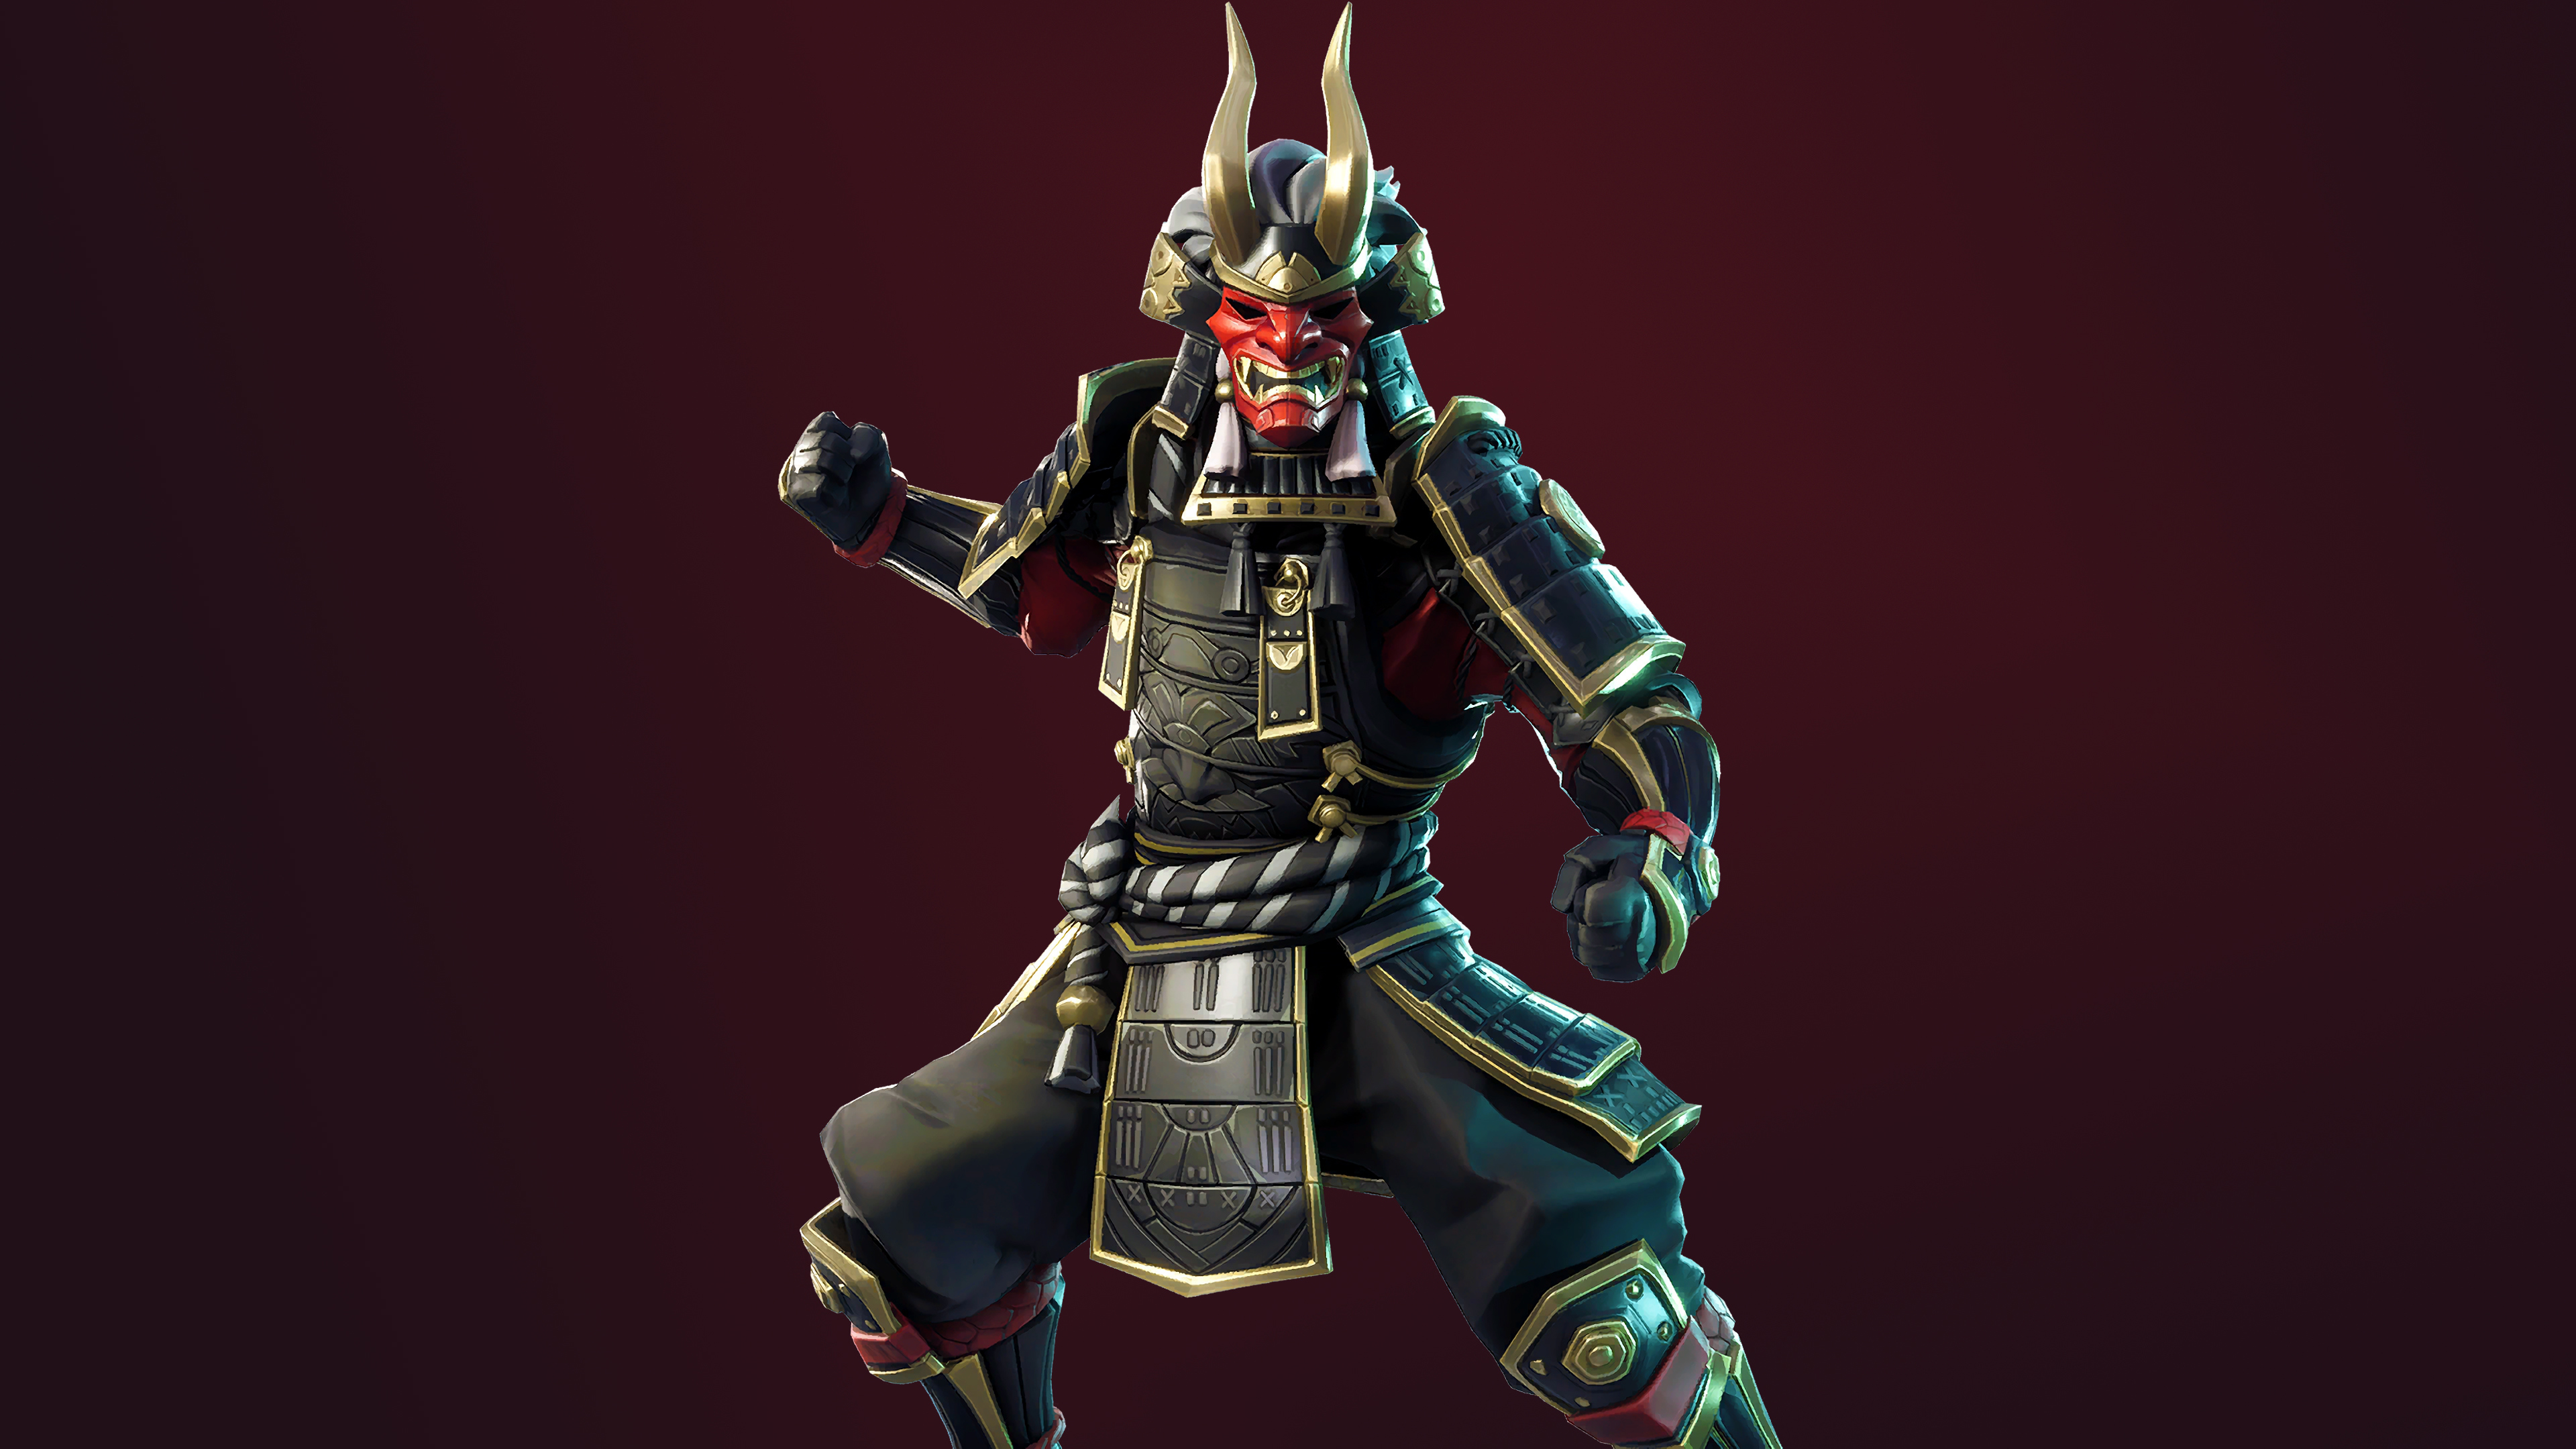 Shogun Fortnite Battle Royale Outfit Skin 4K 26329 3840x2160